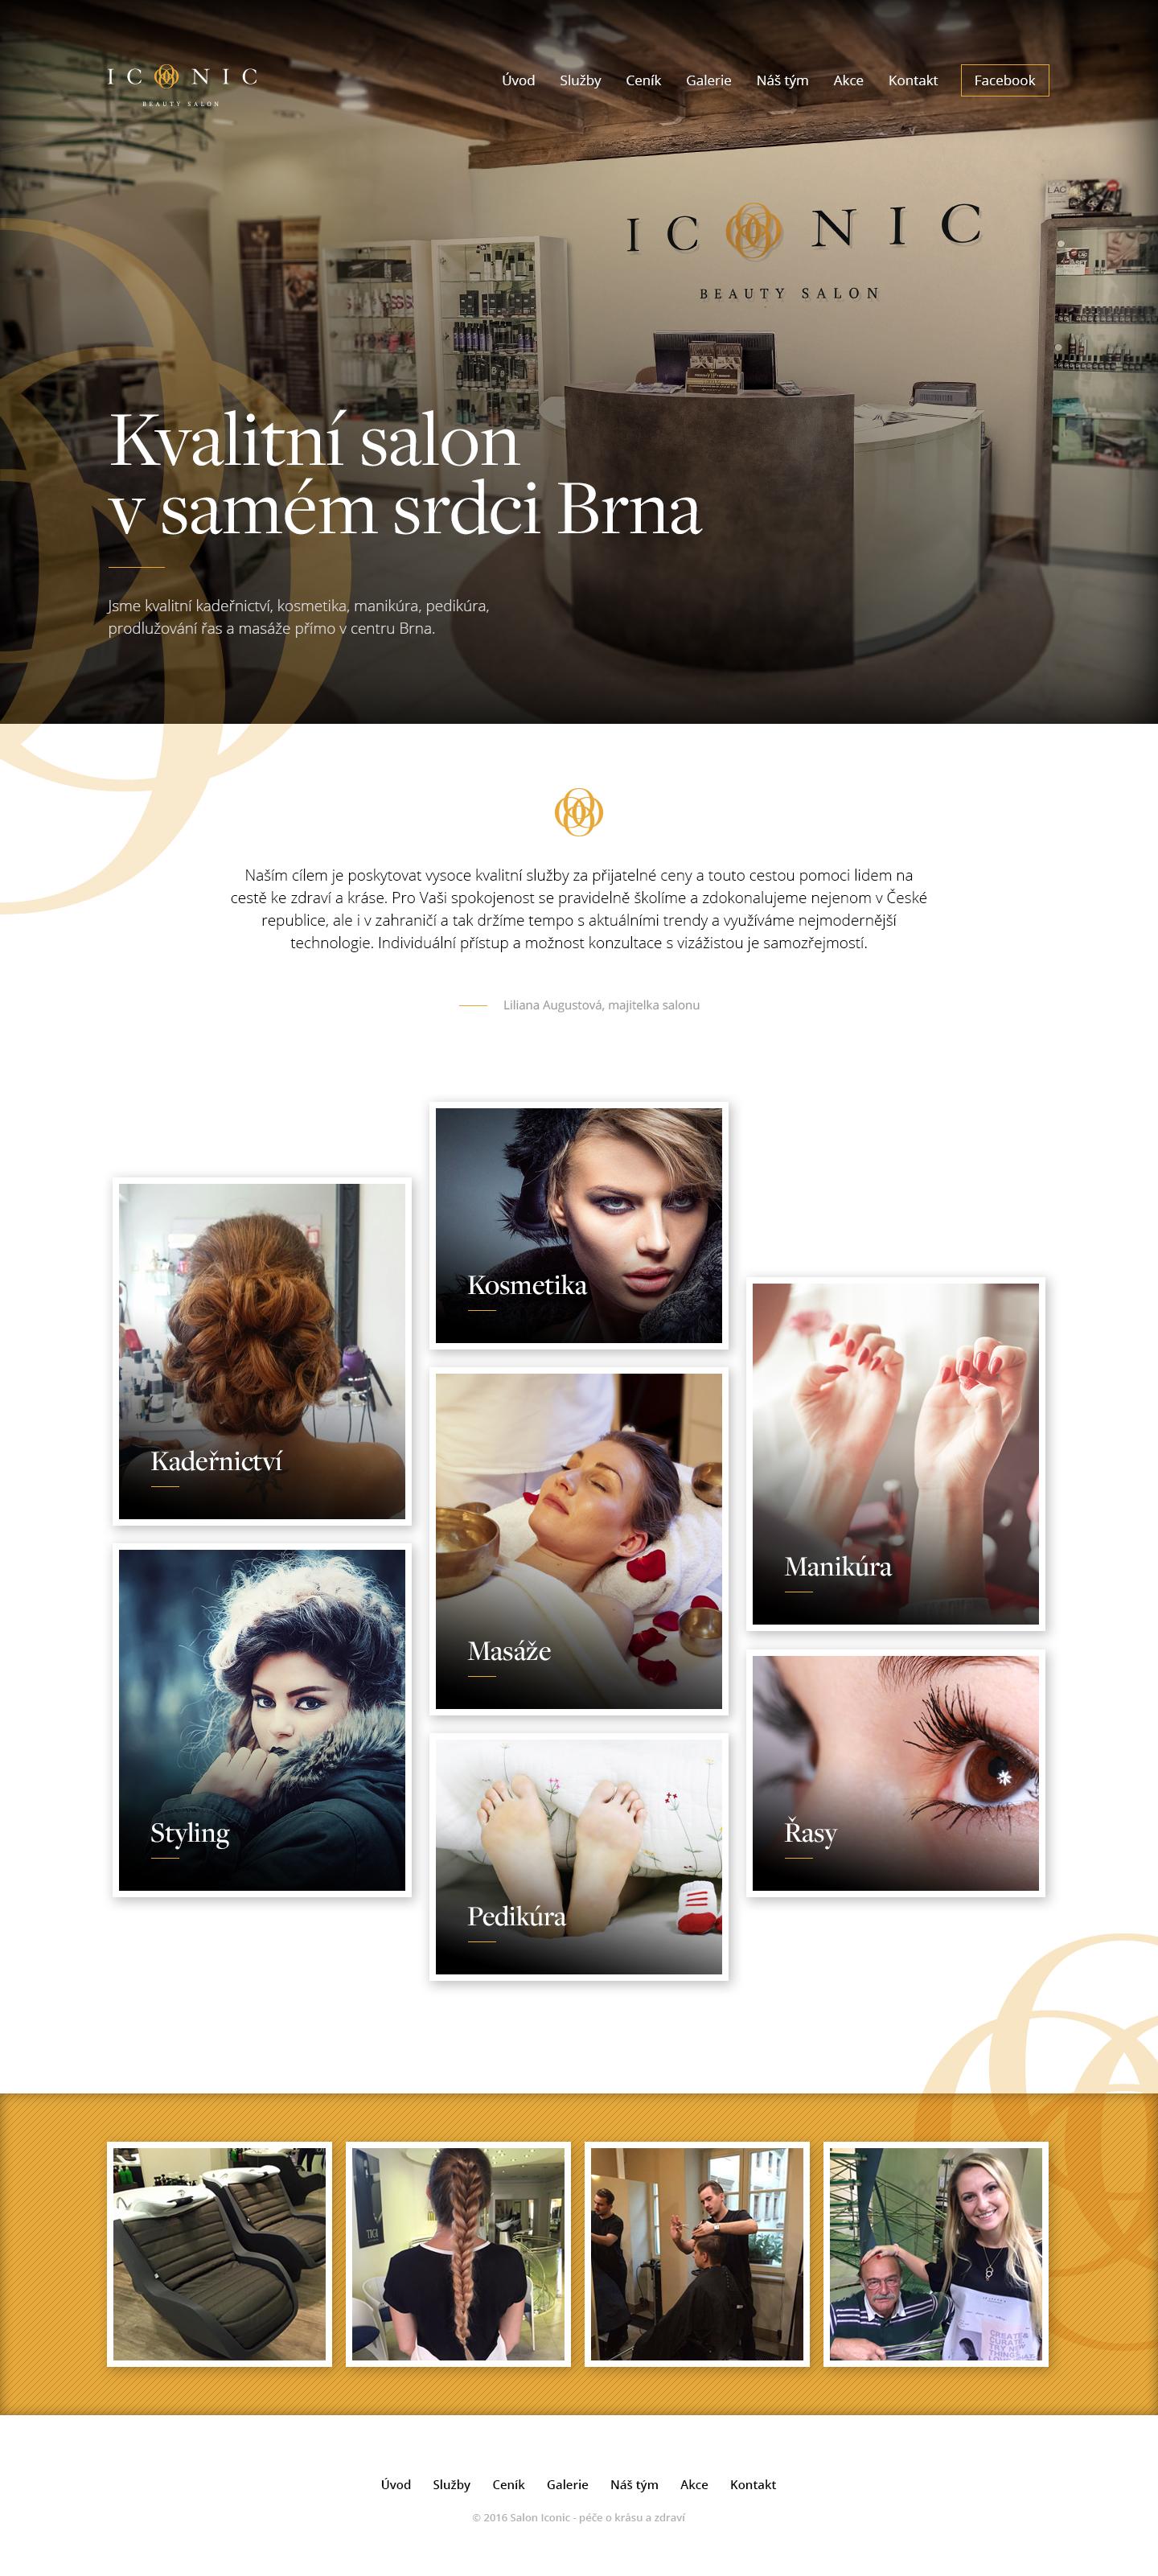 Iconic homepage